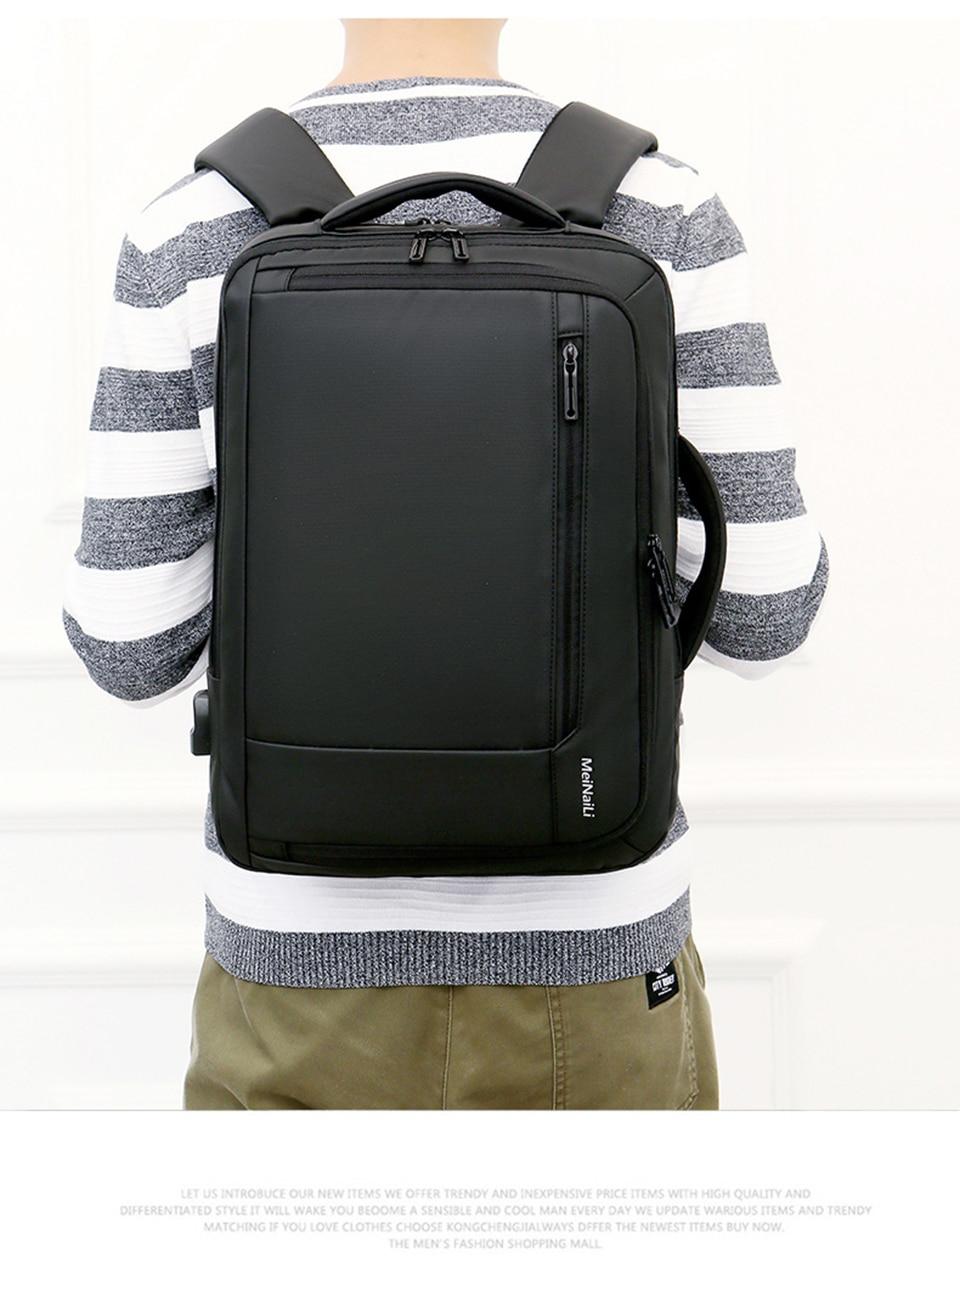 11 Multifunction USB Backpack Man Bag 15.6inch Laptop Backpacks Travel Bags Large Capacity Luggage Backpacking Waterproof Notebook